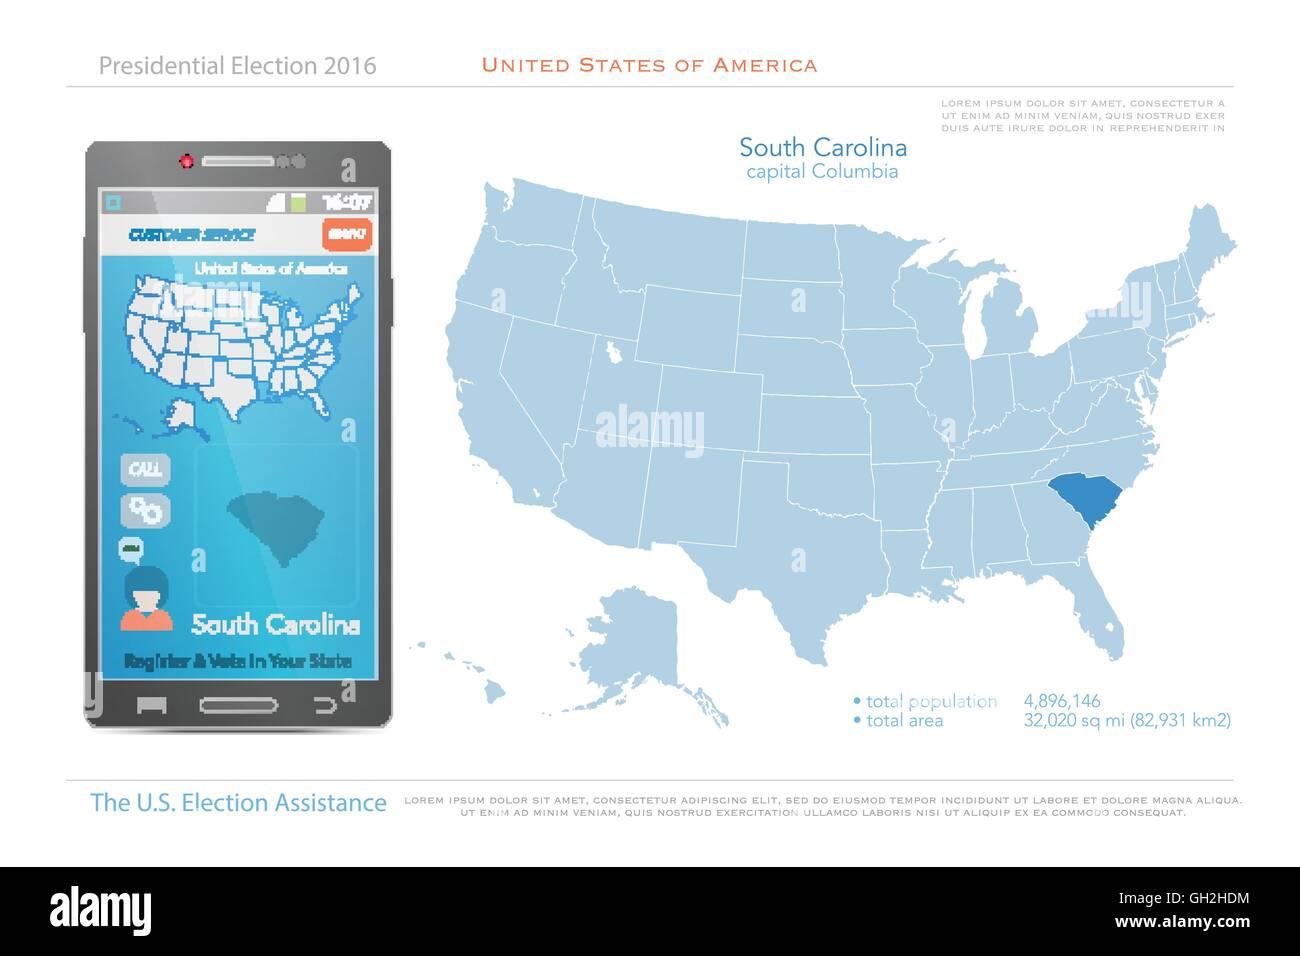 United States of America maps and South Carolina state territory